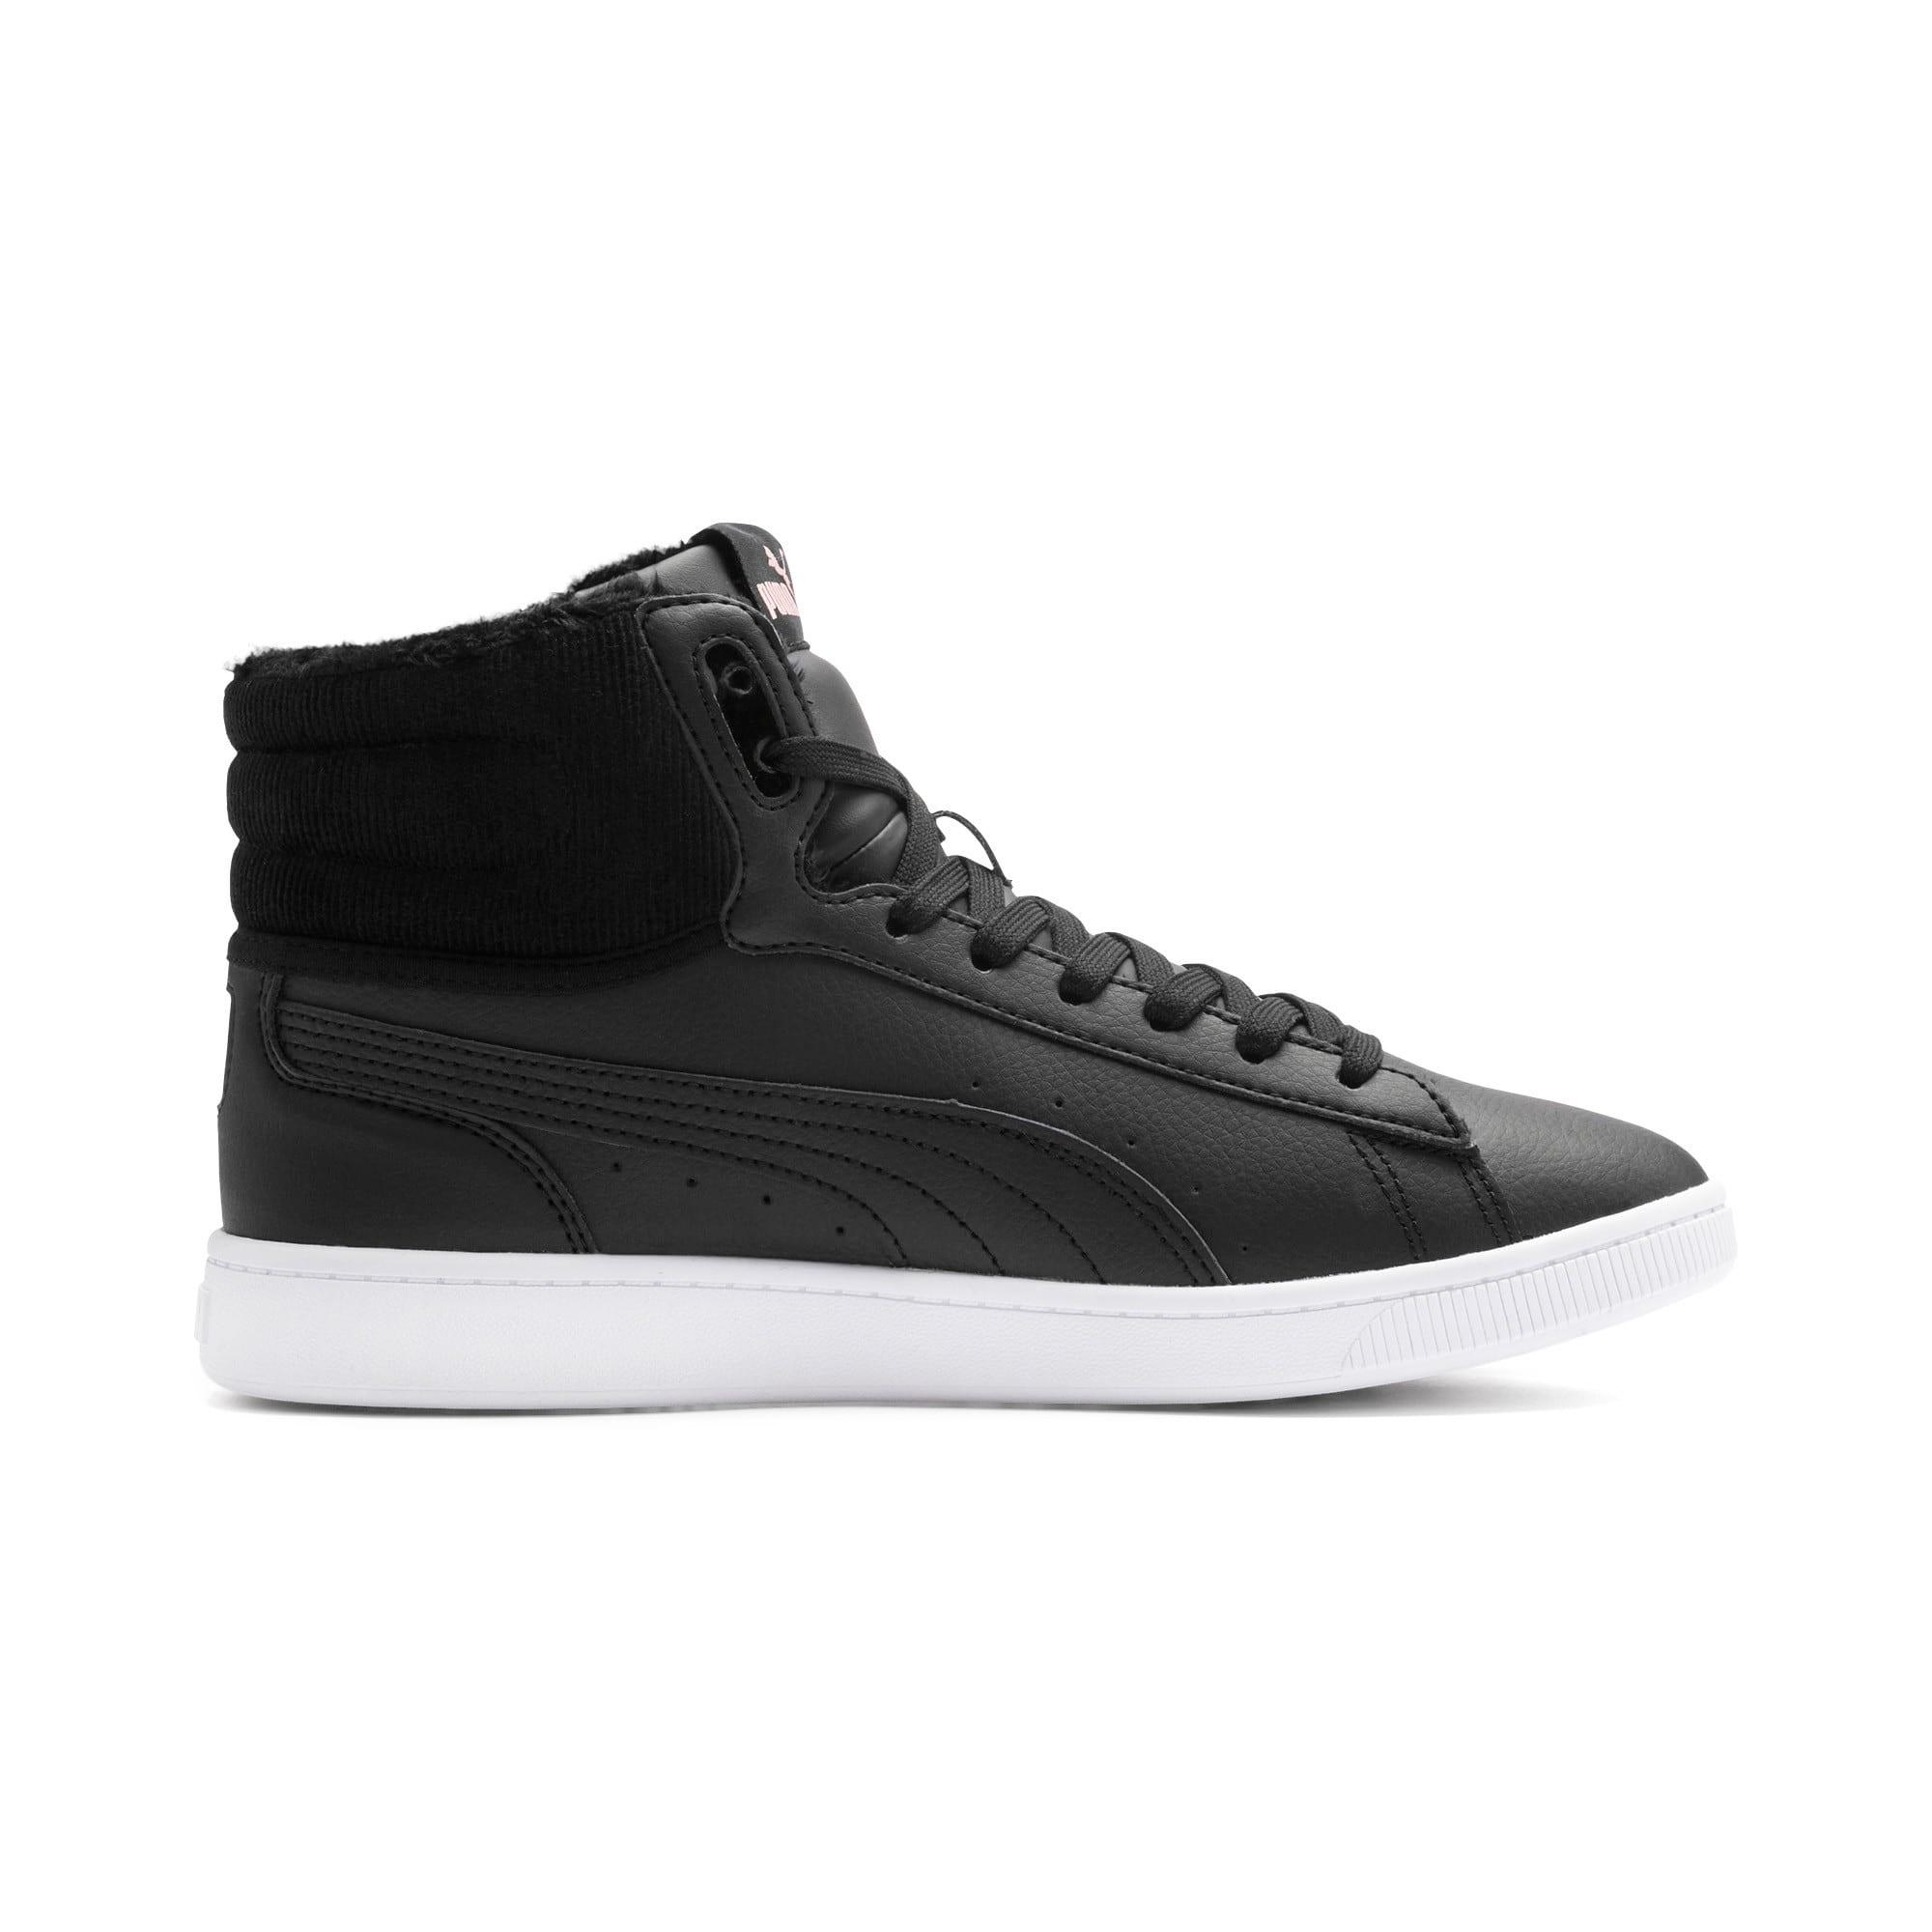 Thumbnail 6 of Vikky v2 mittelhoher Damen Winter Sneaker, Puma Black-Bridal Rose-White, medium